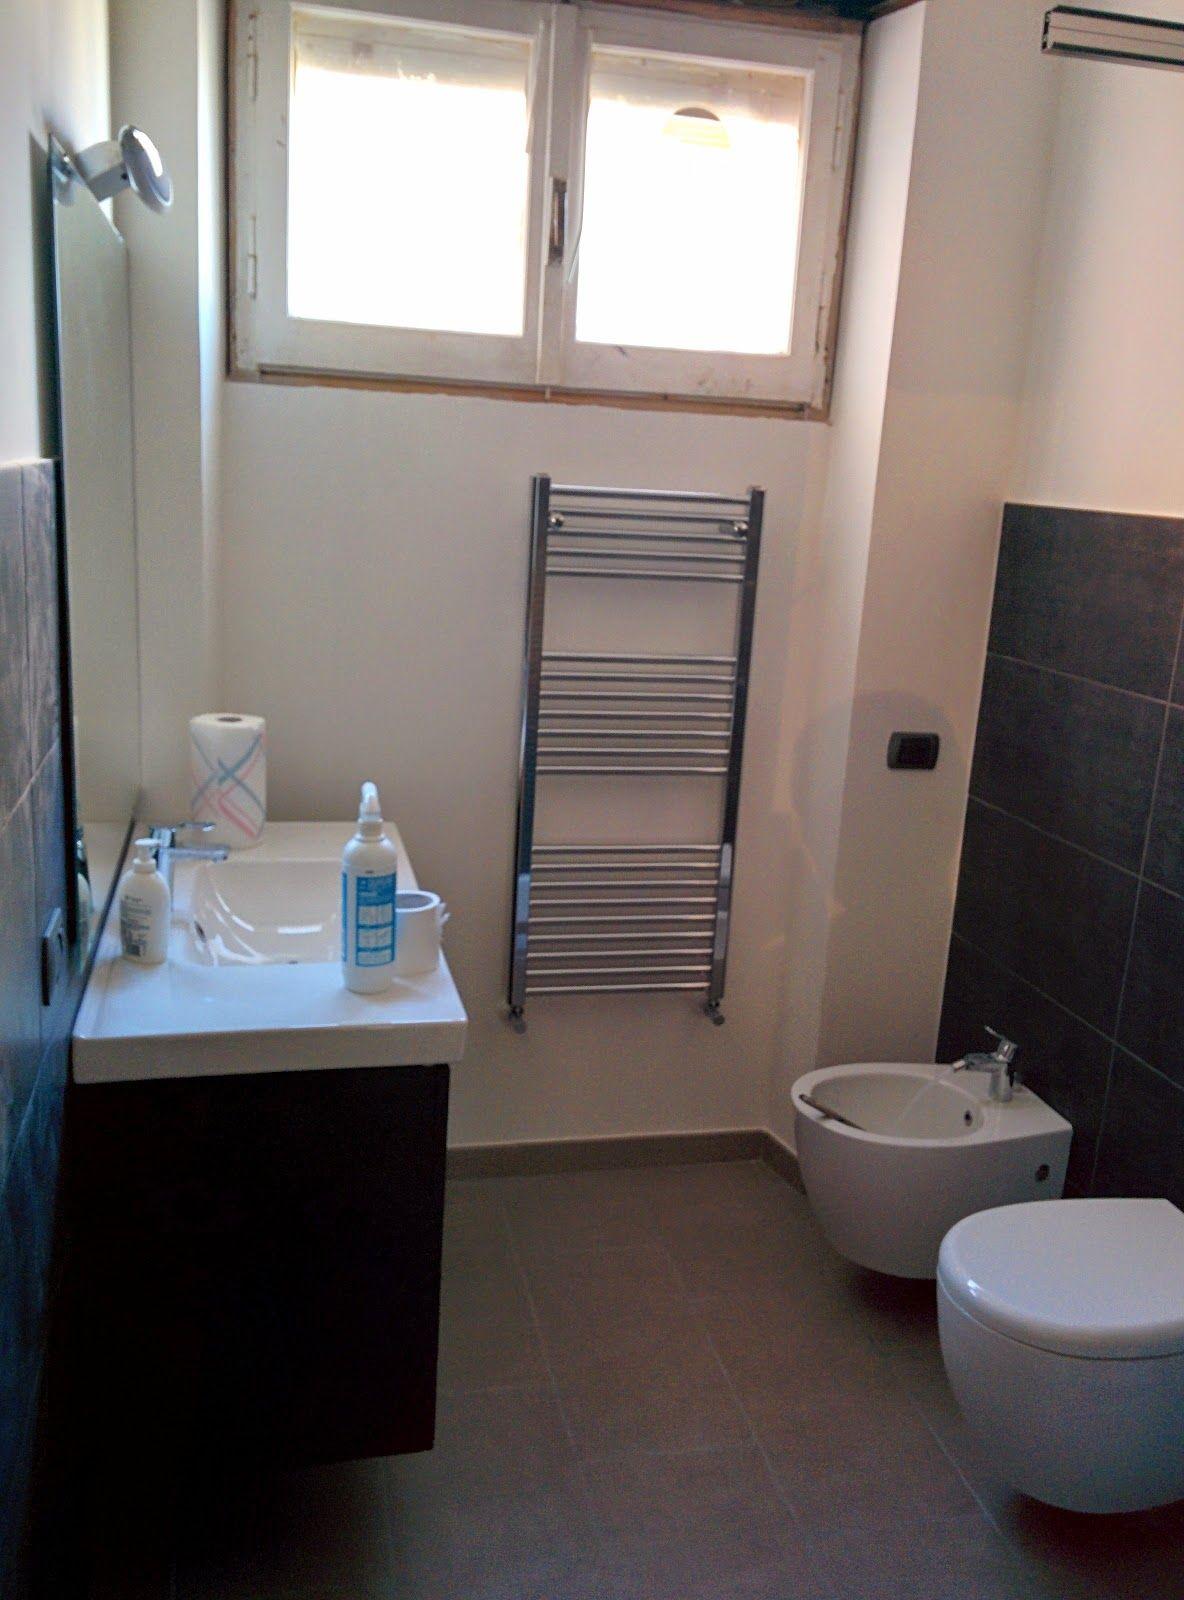 bagno secondario con rivestimento a parete a media